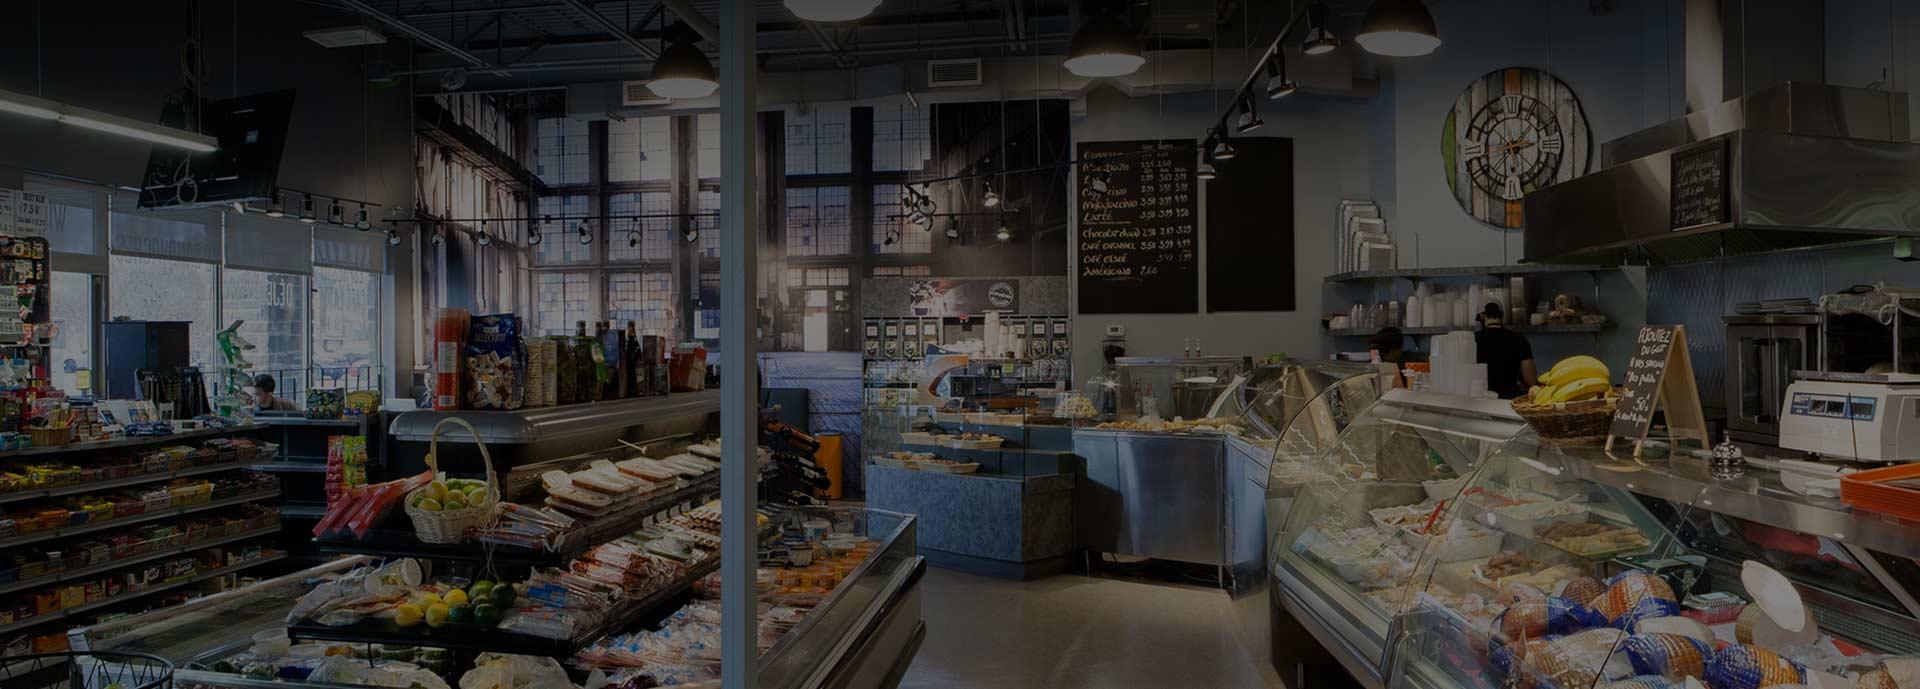 via cassia grocery store in sainte-dorothée